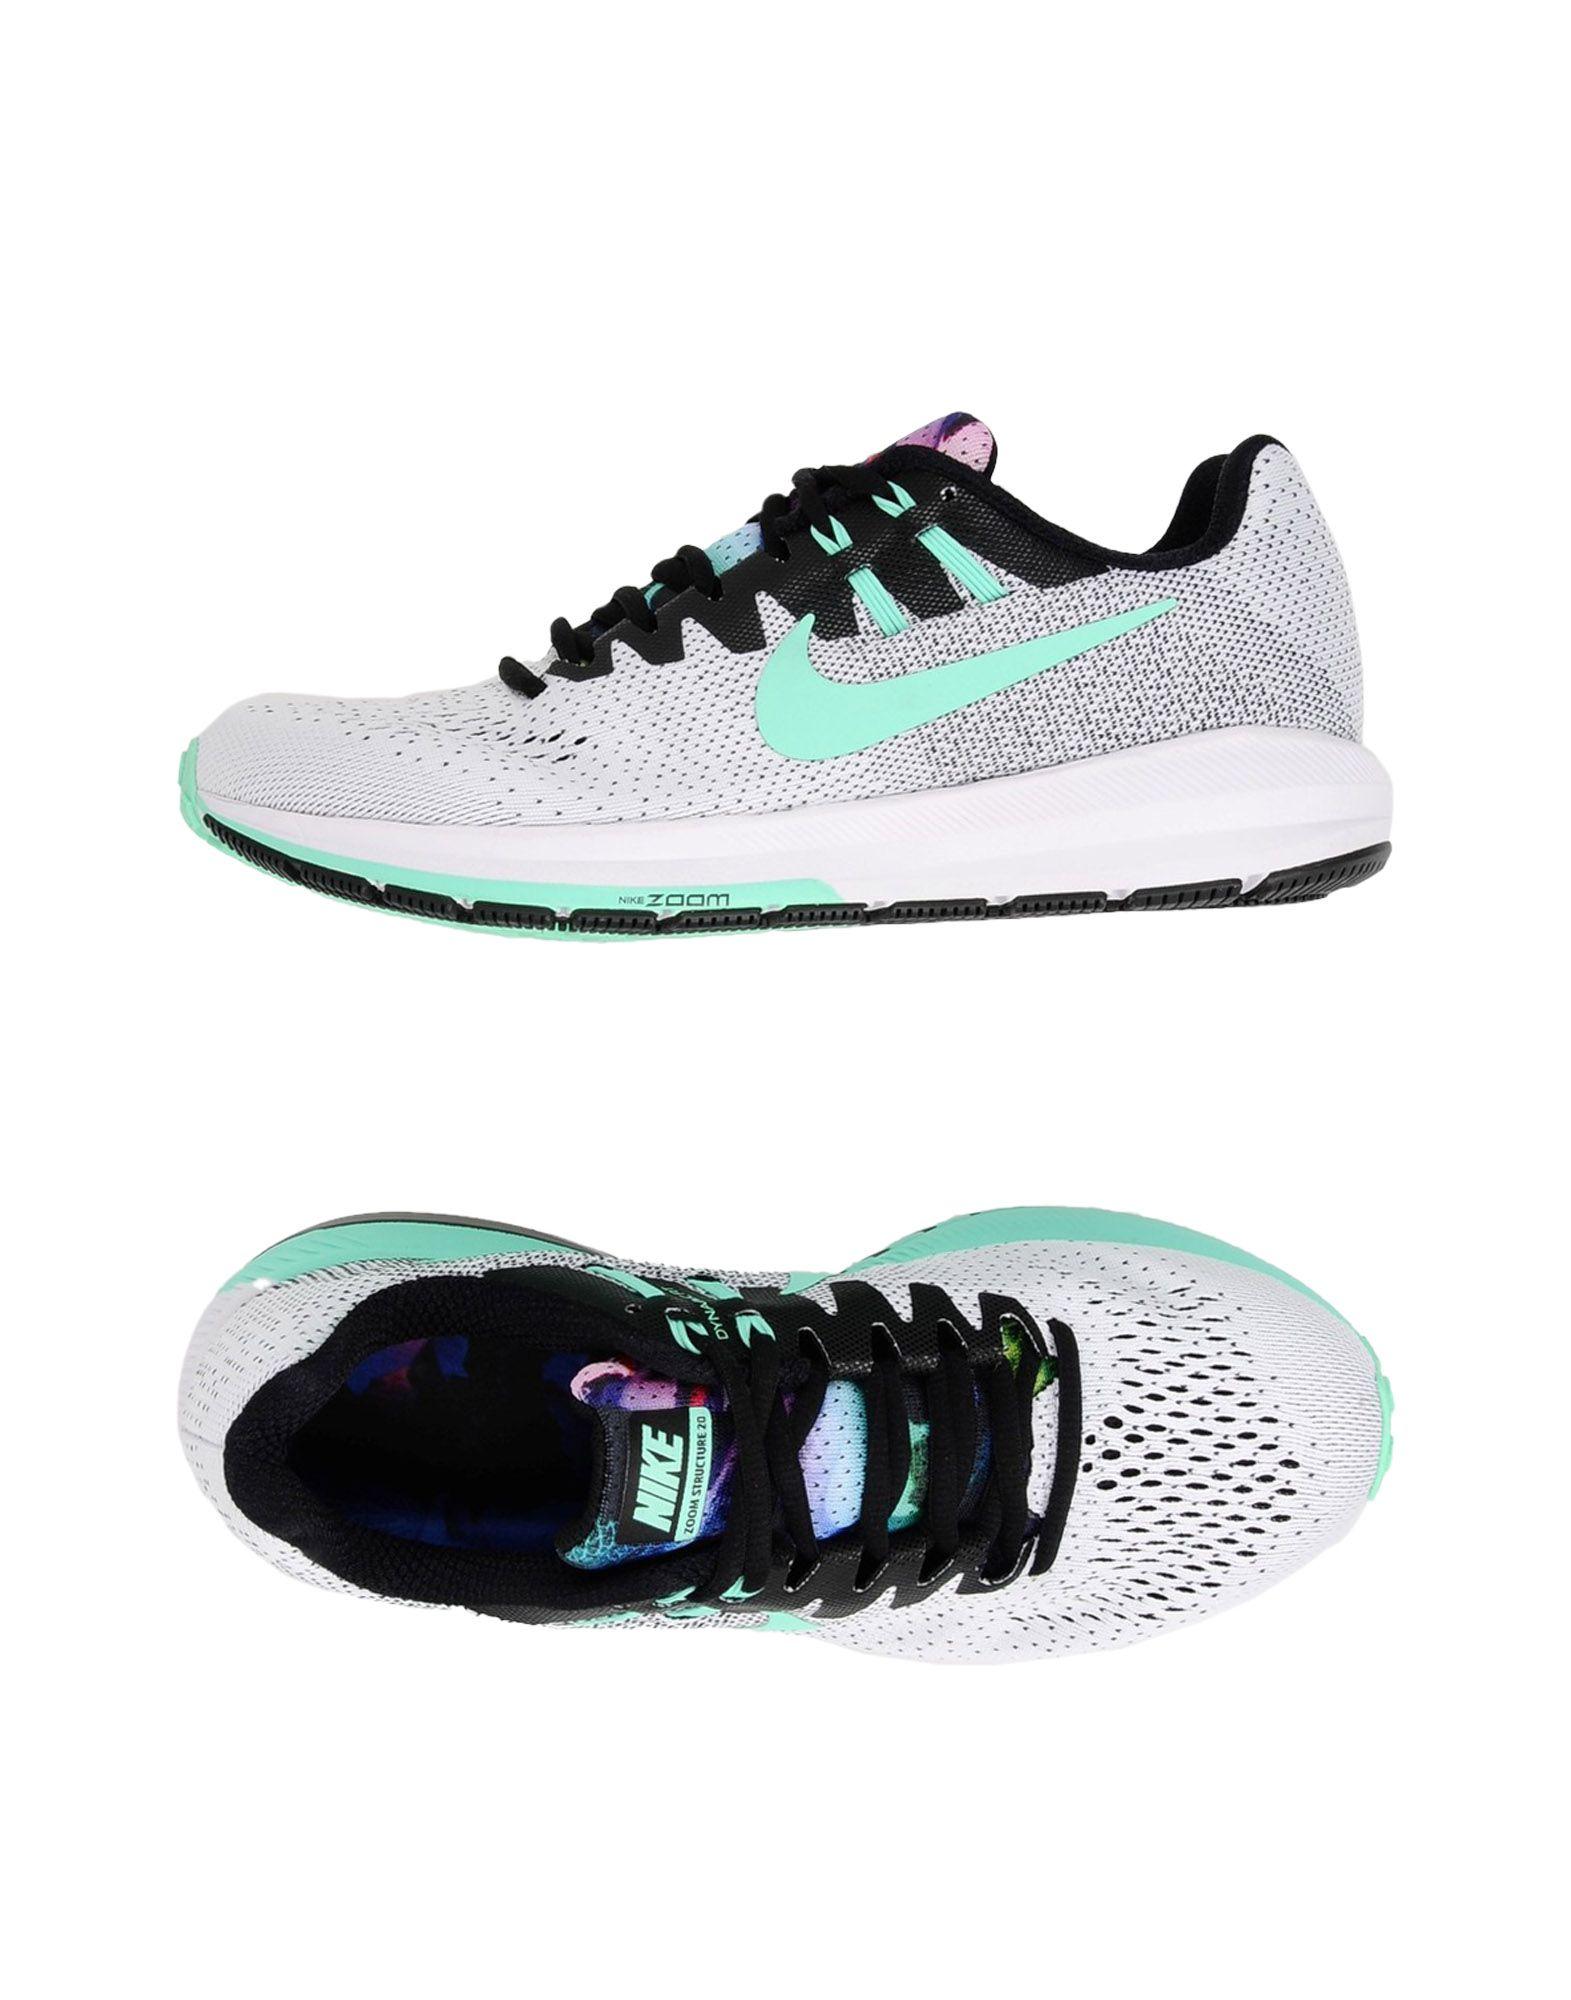 Turnschuhe Nike Air Zoom Structure 20 Solstice - damen - 11288615ET